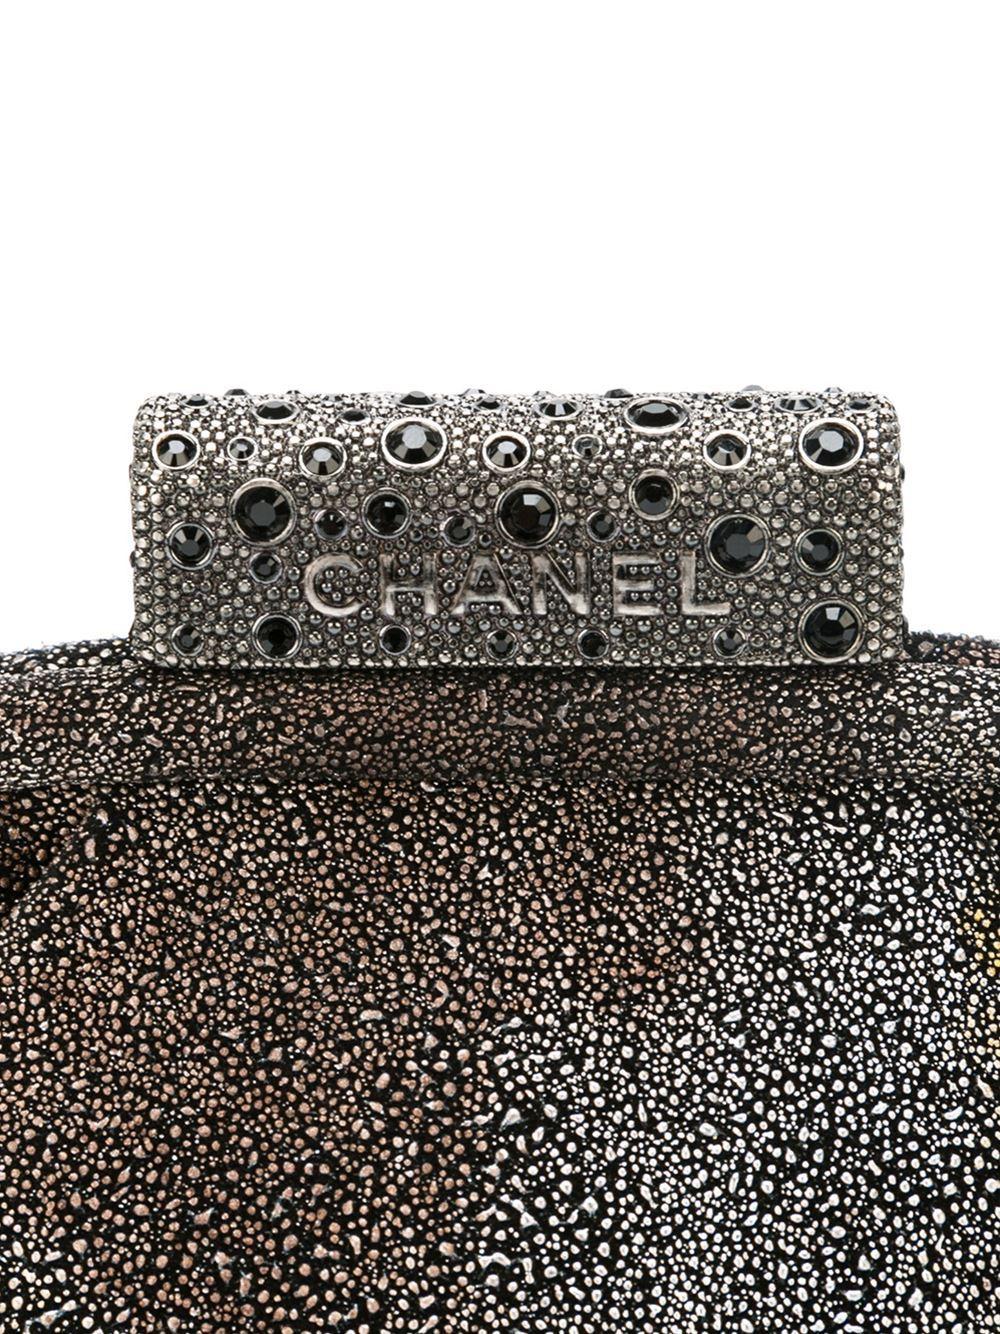 Women's Chanel Degradé Stingray Clutch For Sale